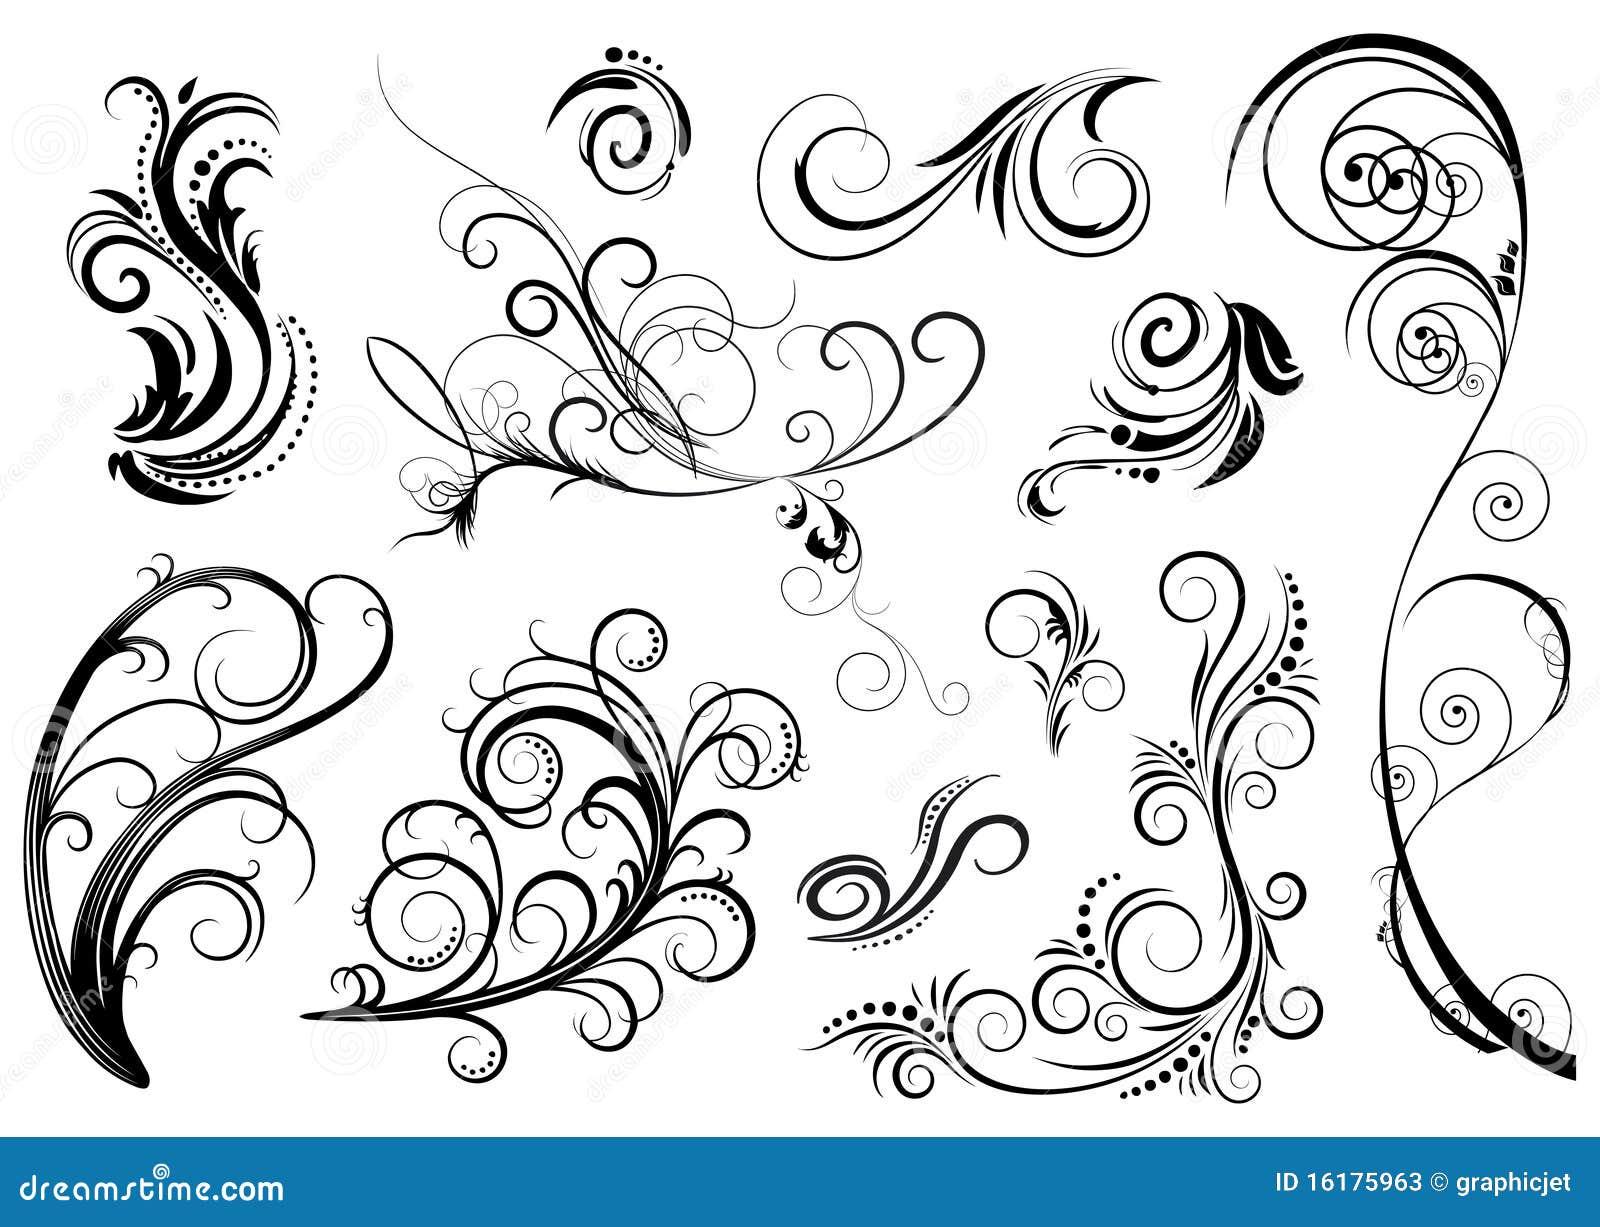 Black flower design elements stock vector illustration for Scarica clipart